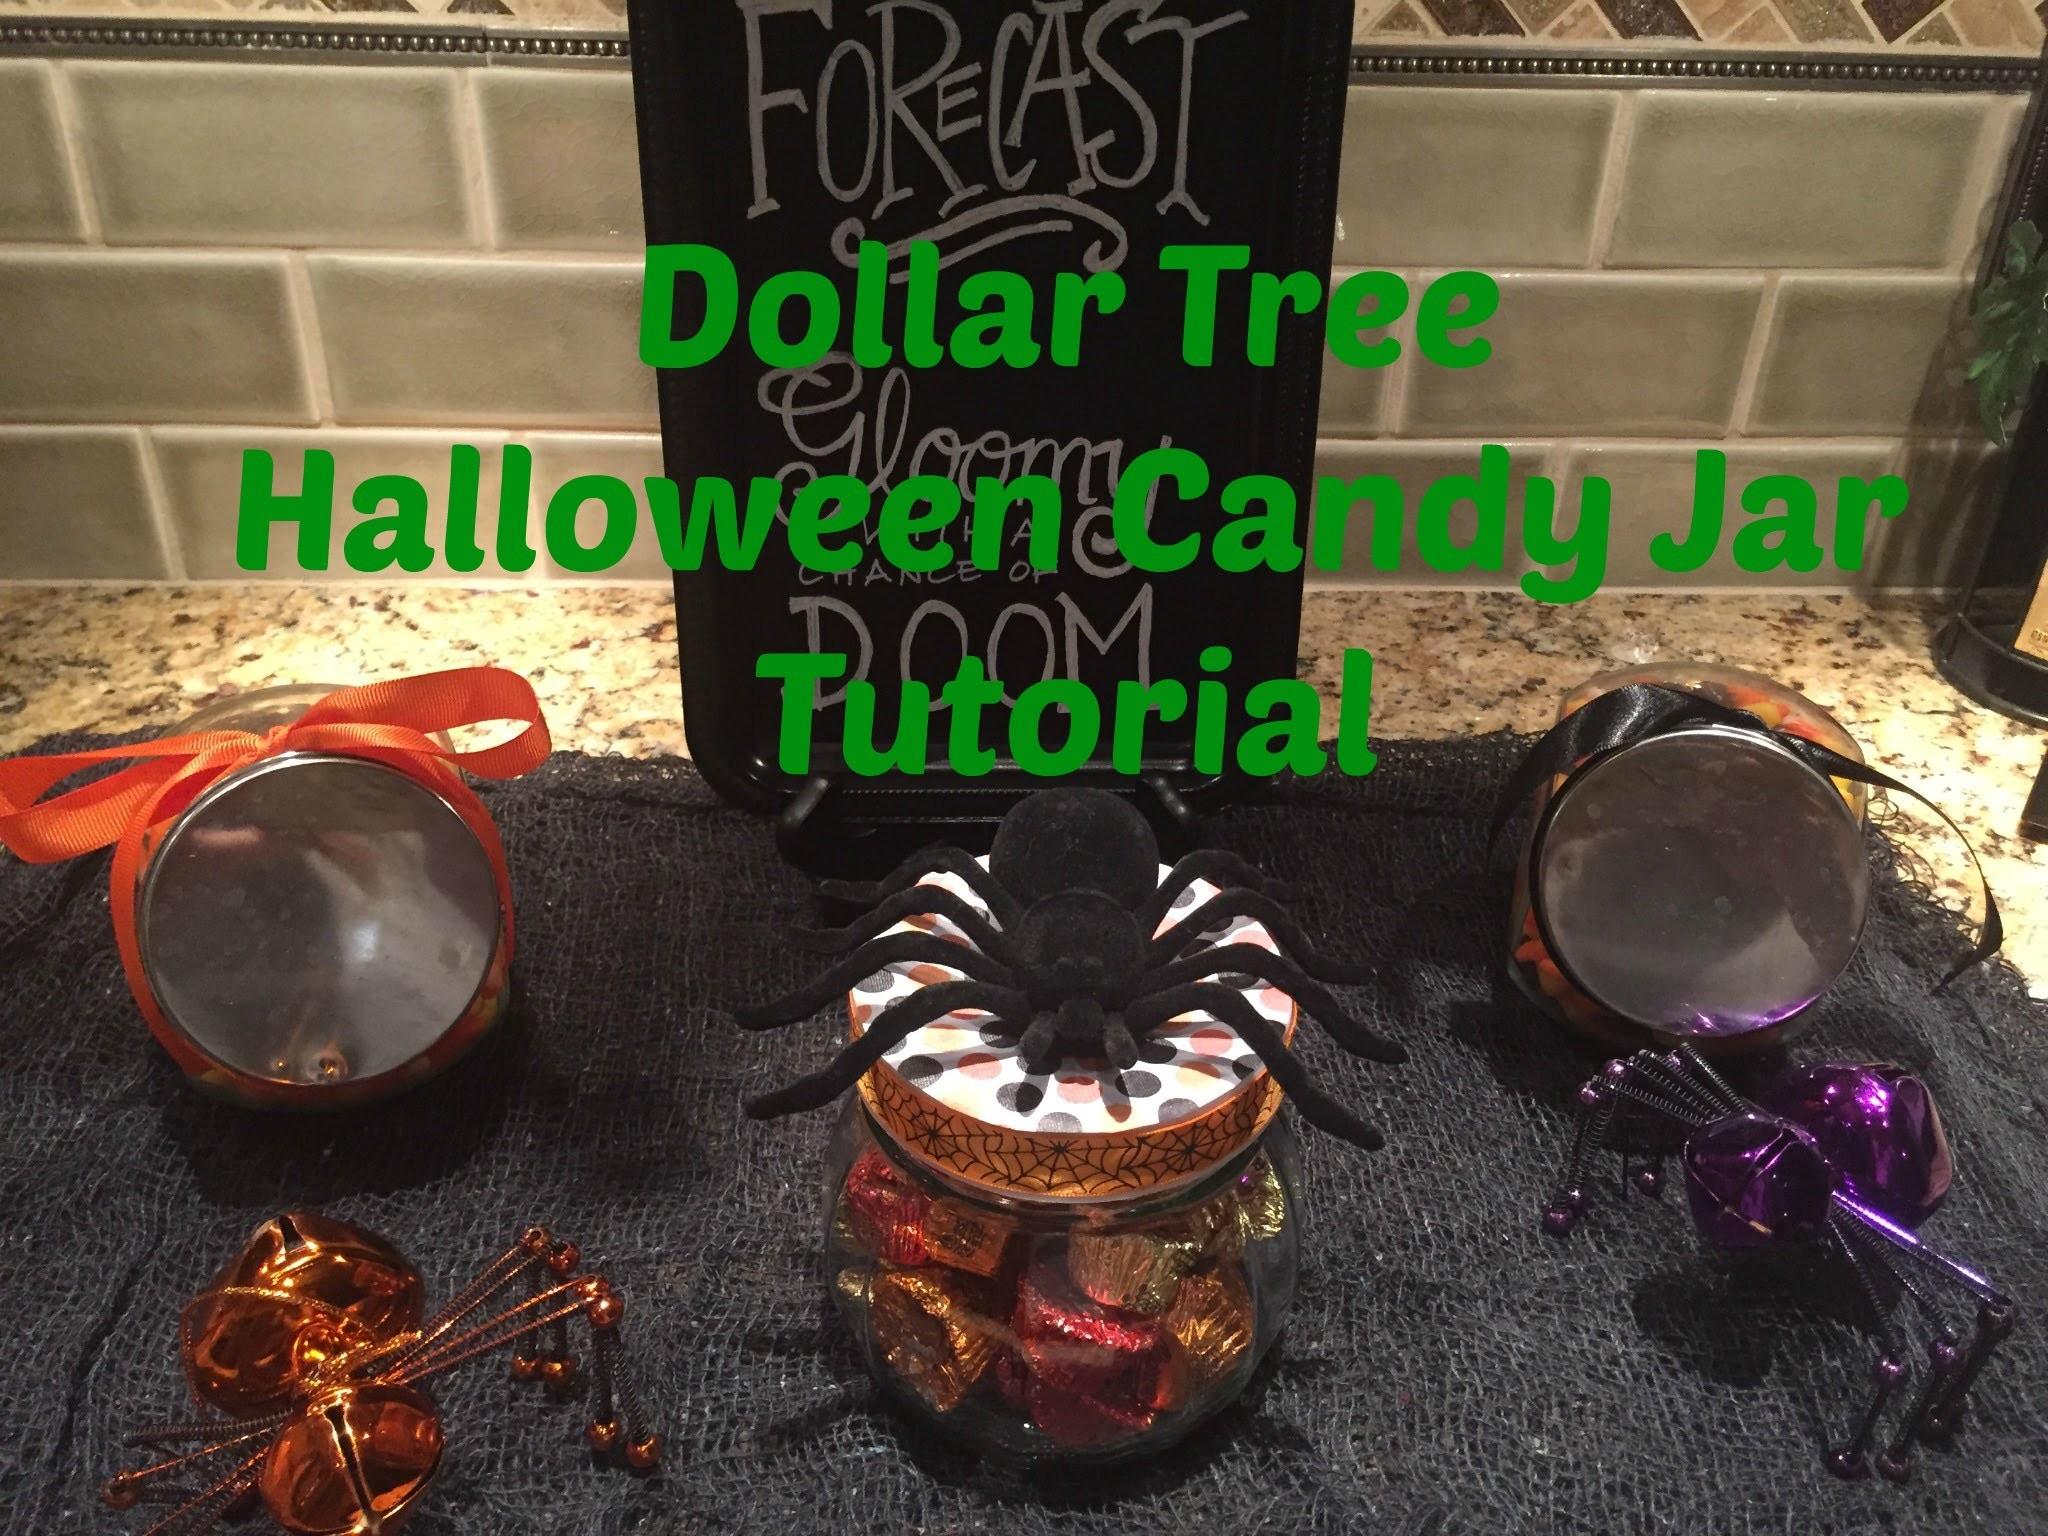 Dollar Tree Halloween Candy Jar Tutorial